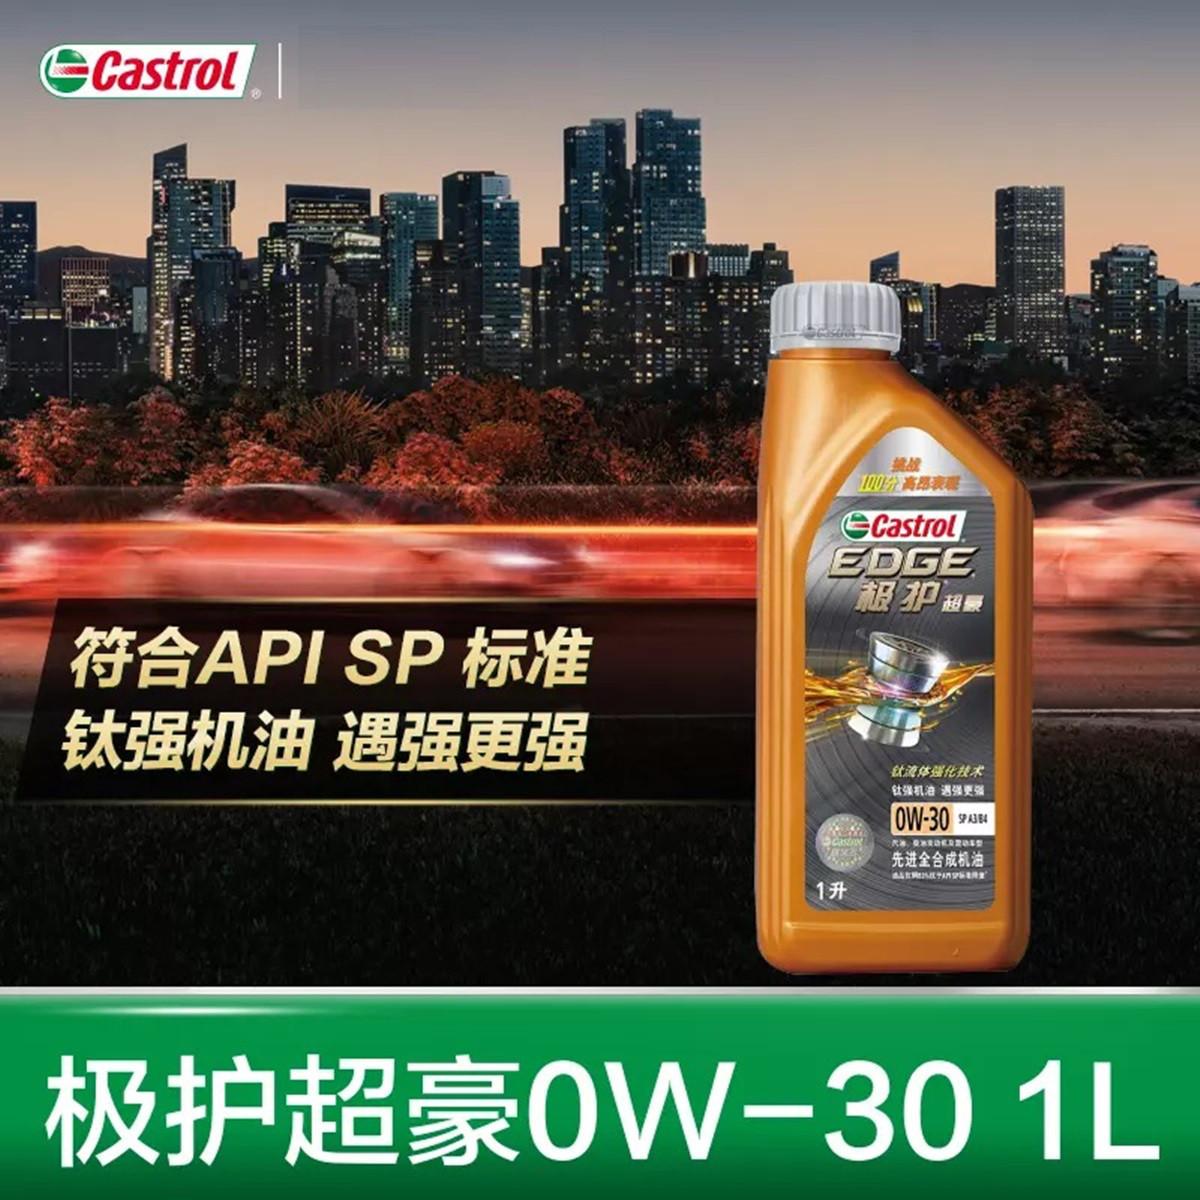 Castrol 新品升级嘉实多极护超豪0W-40 1L SN PLUS全合成机油 润滑油